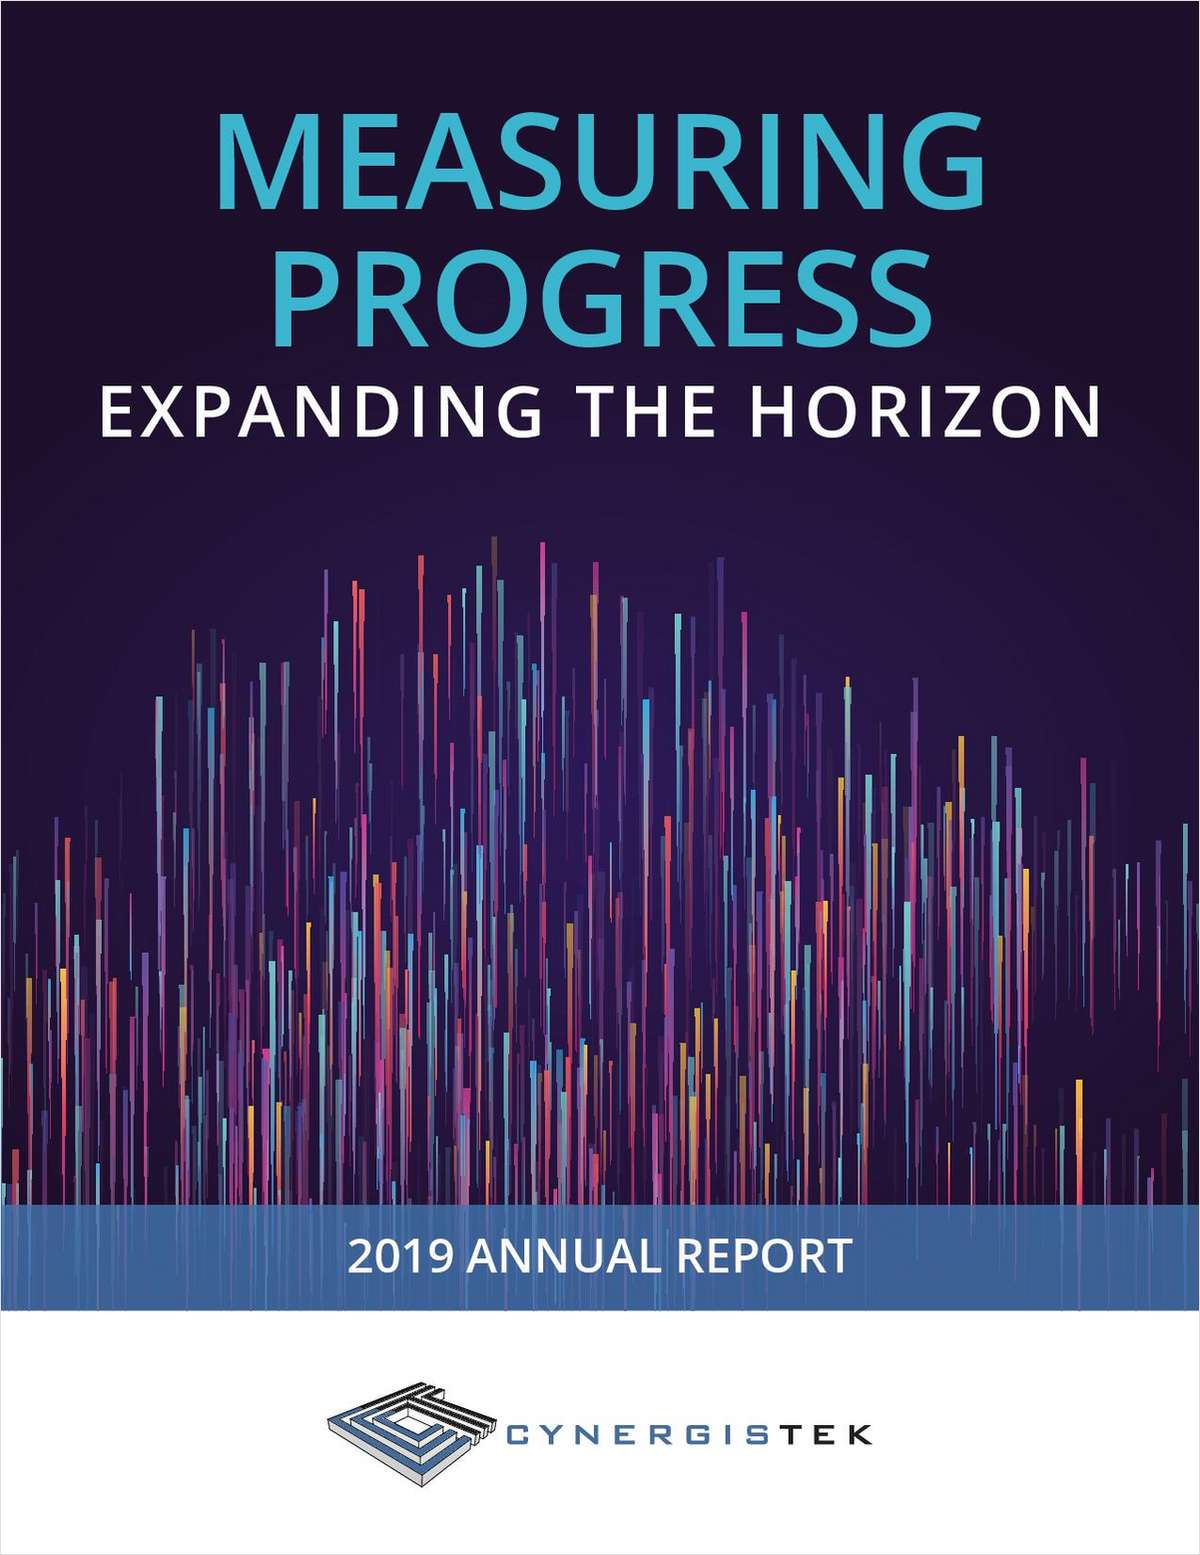 Measuring Progress: Expanding the Horizon | 2019 Annual Report